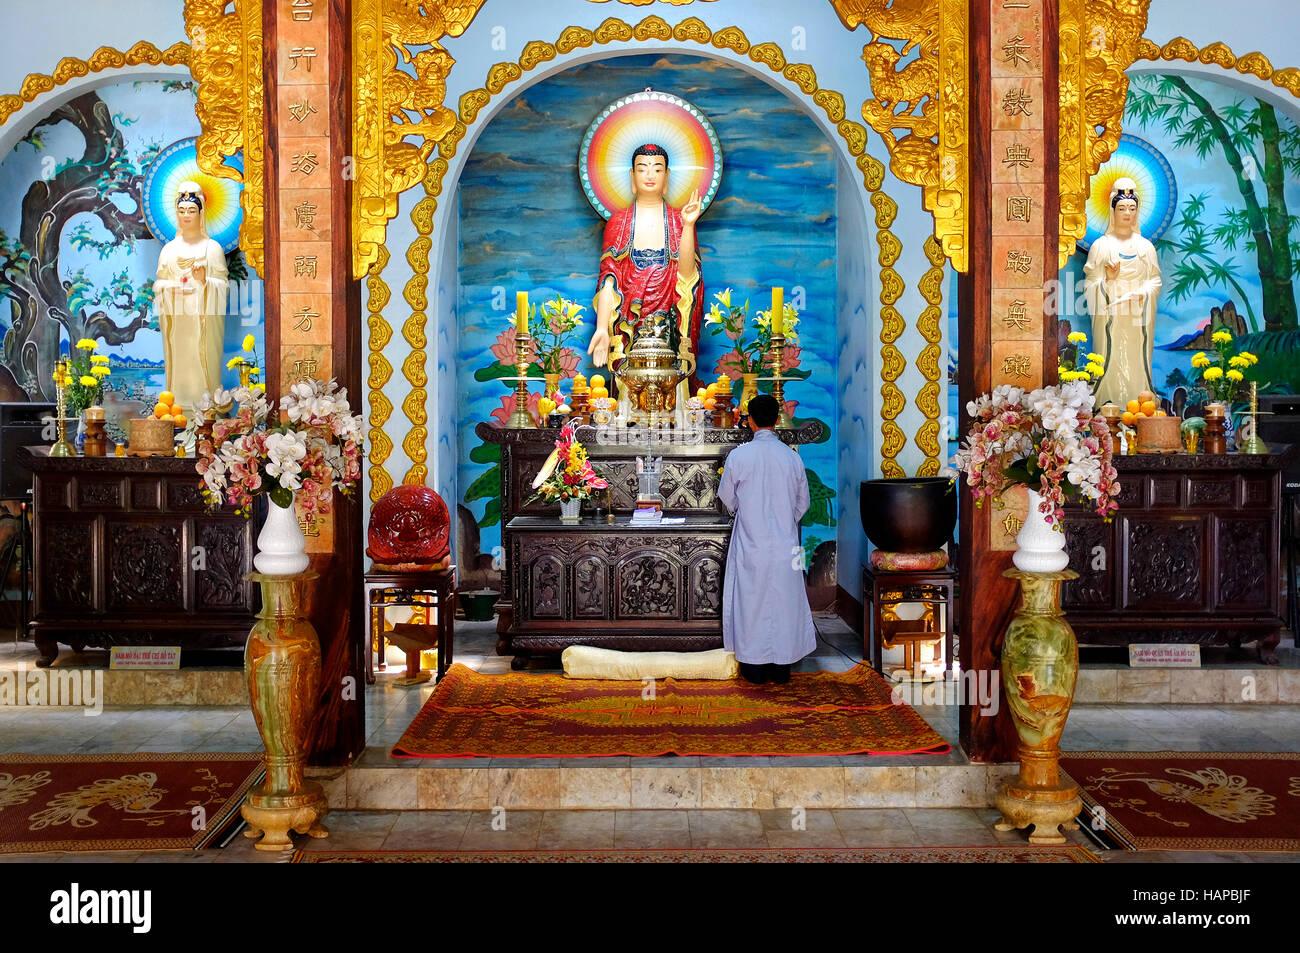 Altar of the Tam Thai Pagoda, Da Nang, Vietnam - Stock Image